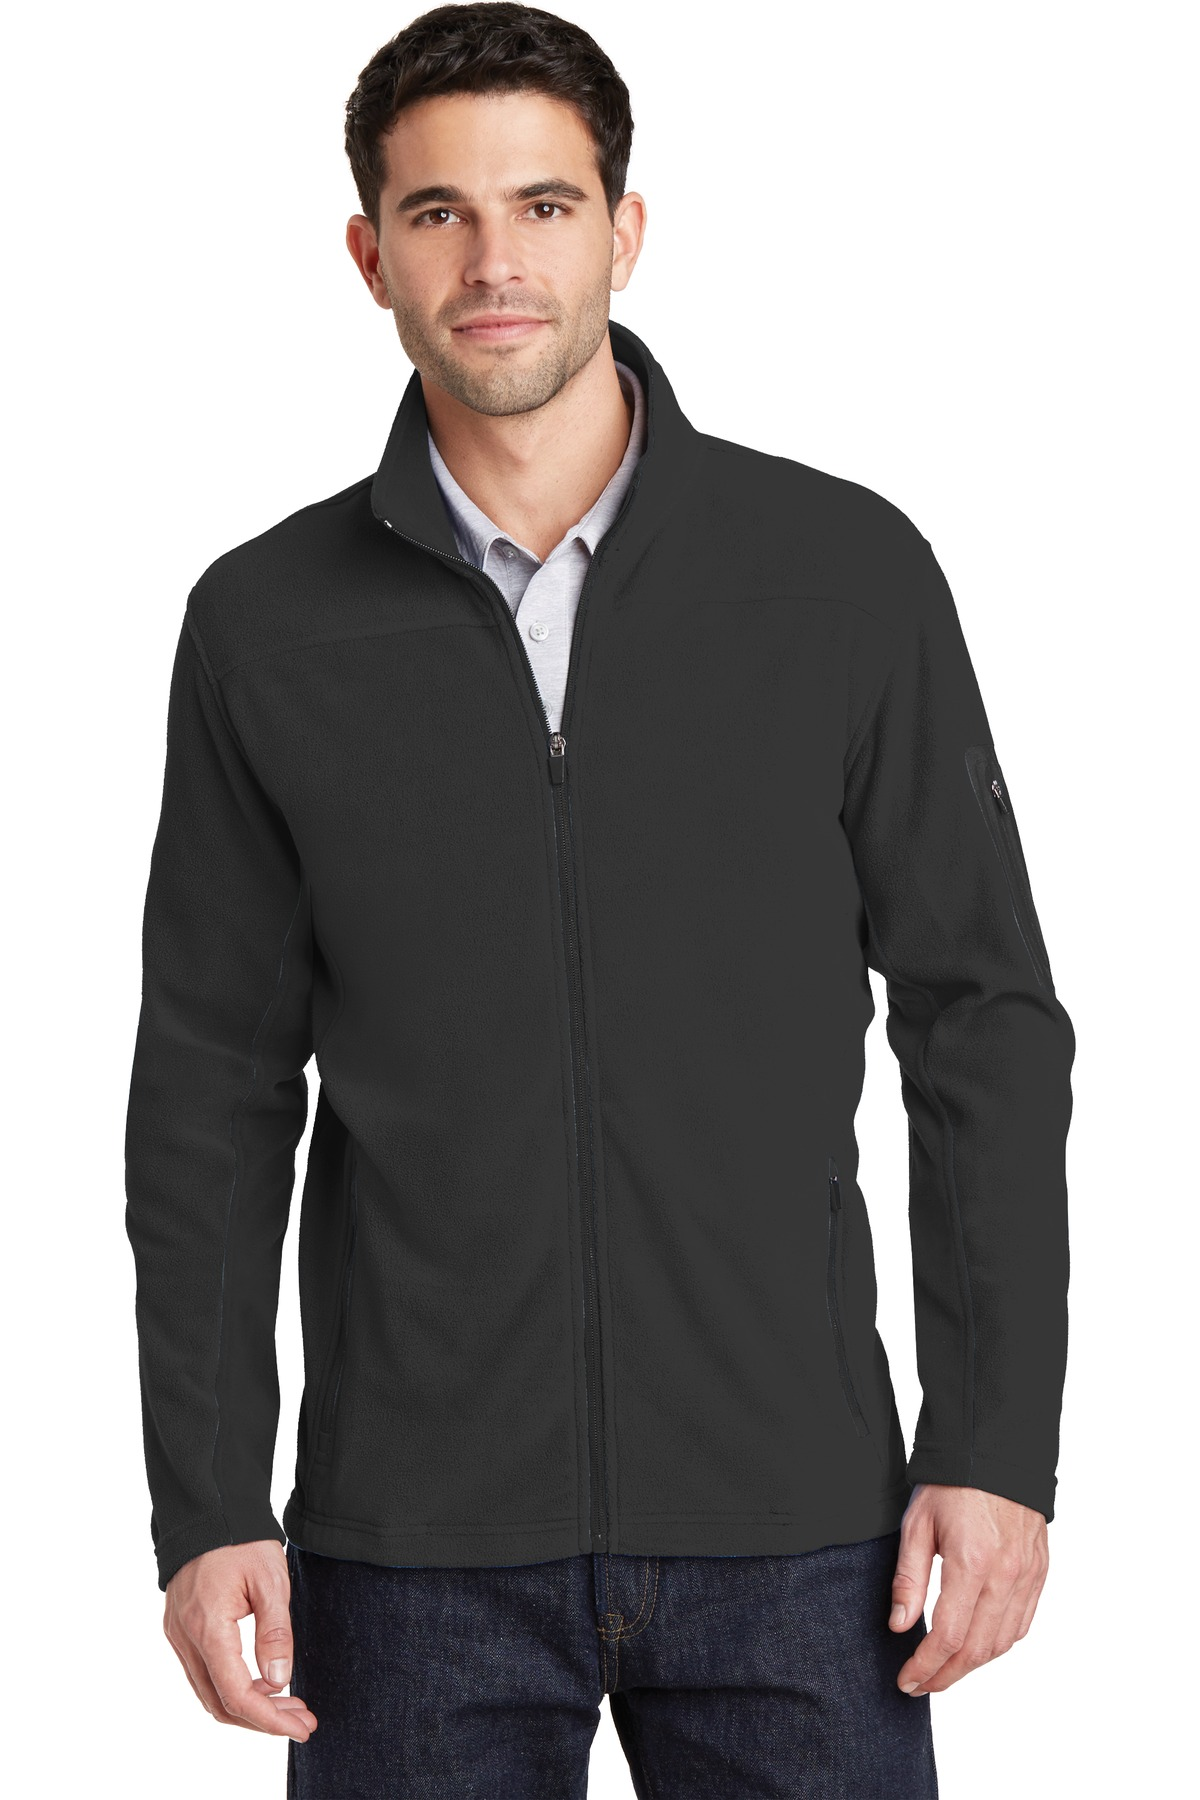 Port Authority Summit Fleece Full-Zip Jacket. -